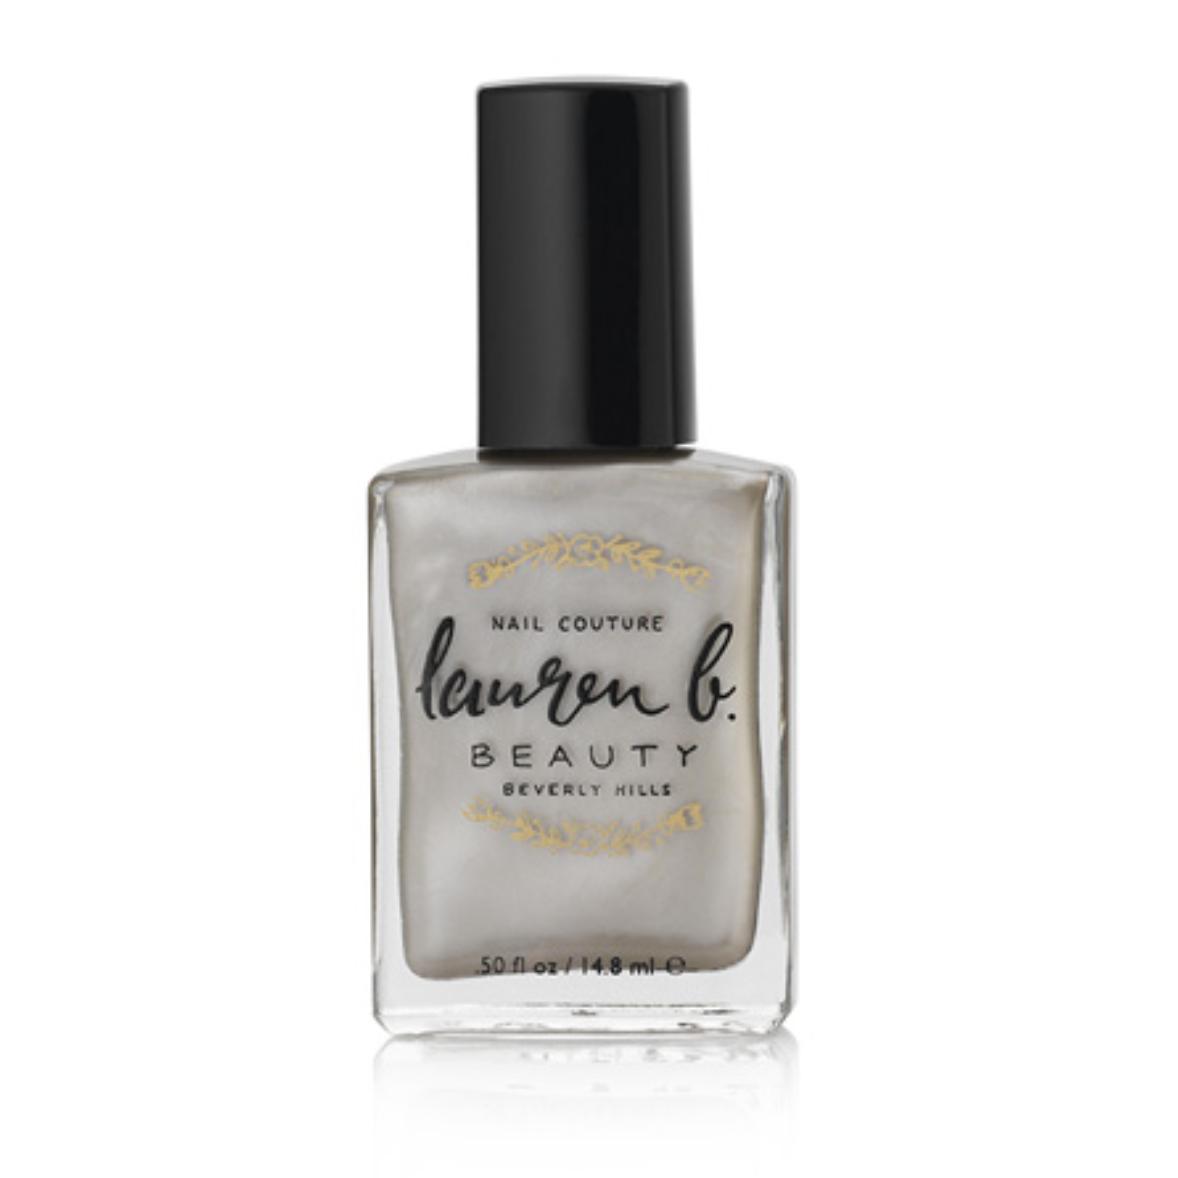 Lauren B. Beauty nail polish in Dancing Shoes, a metallic taupe shade